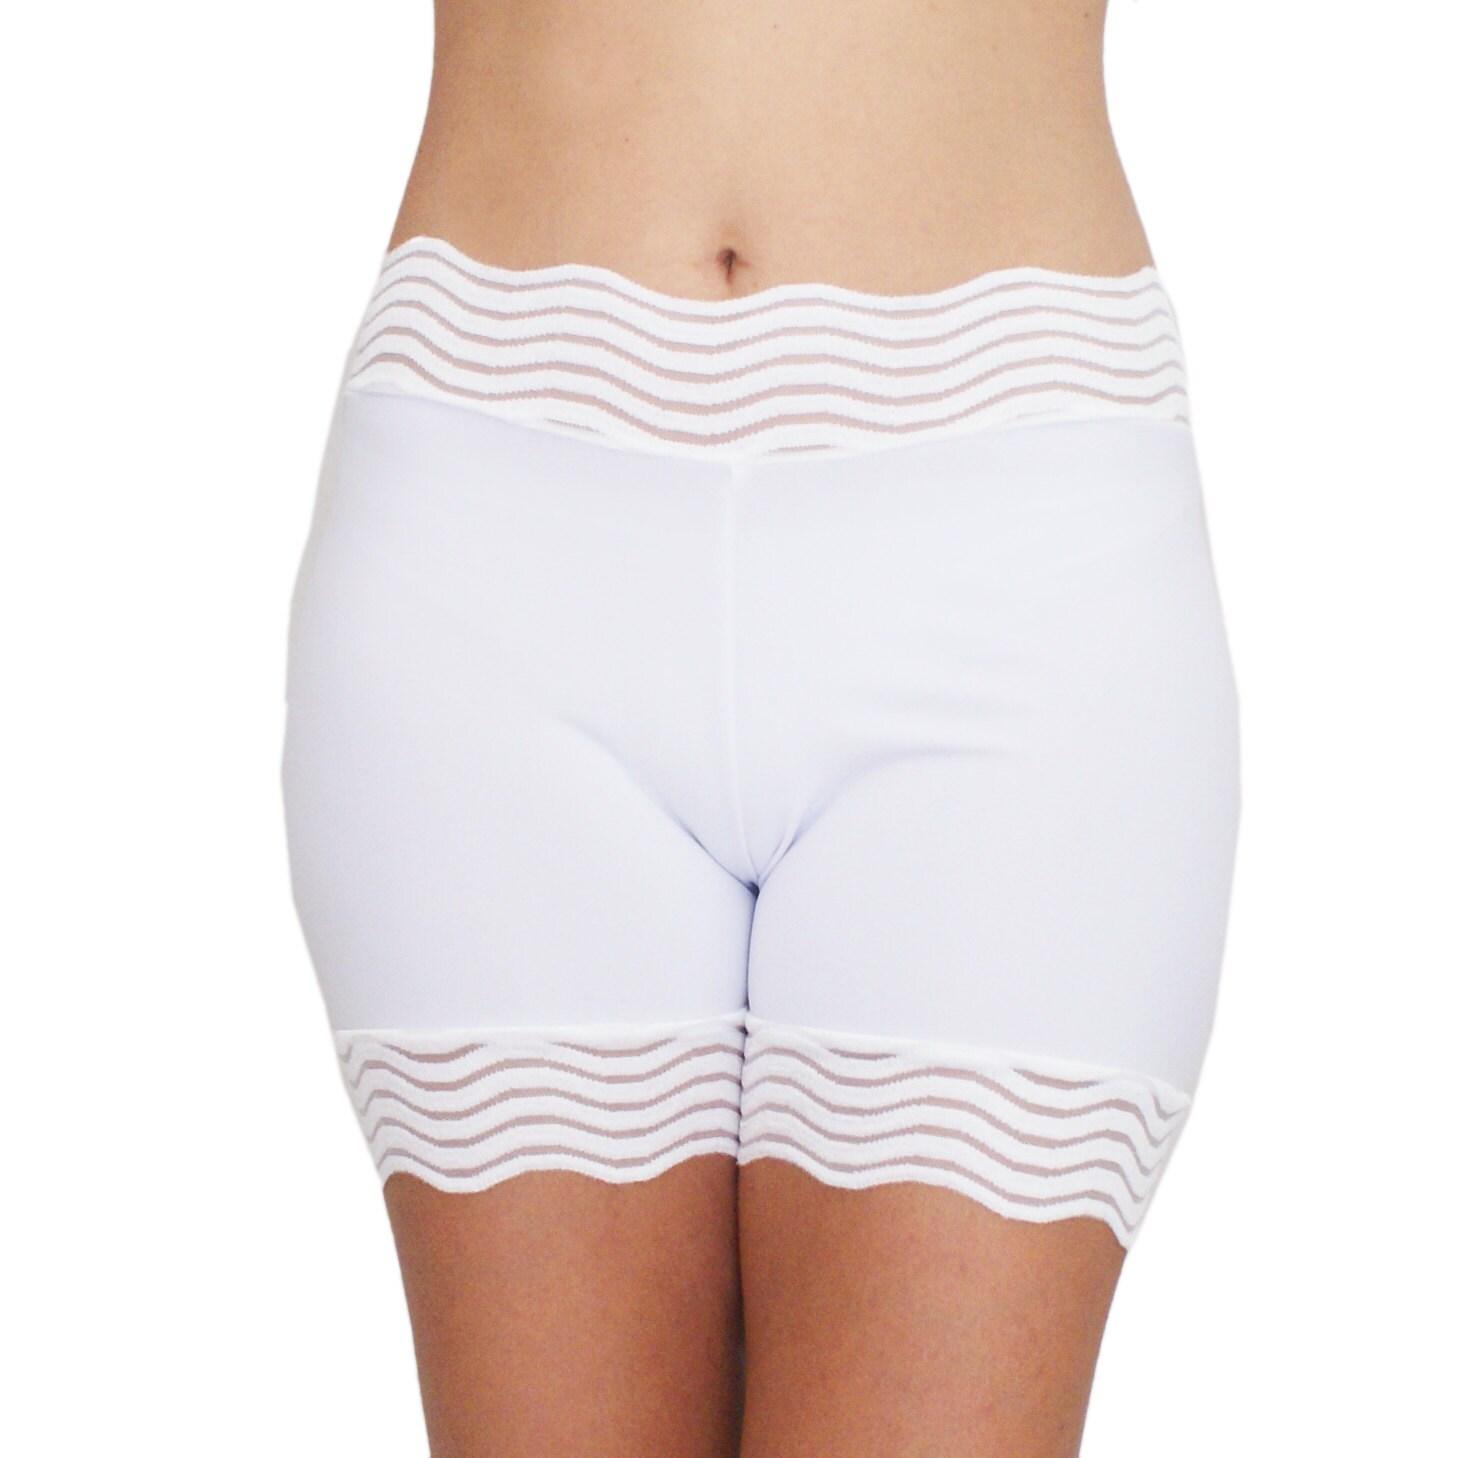 Bridal Underpants